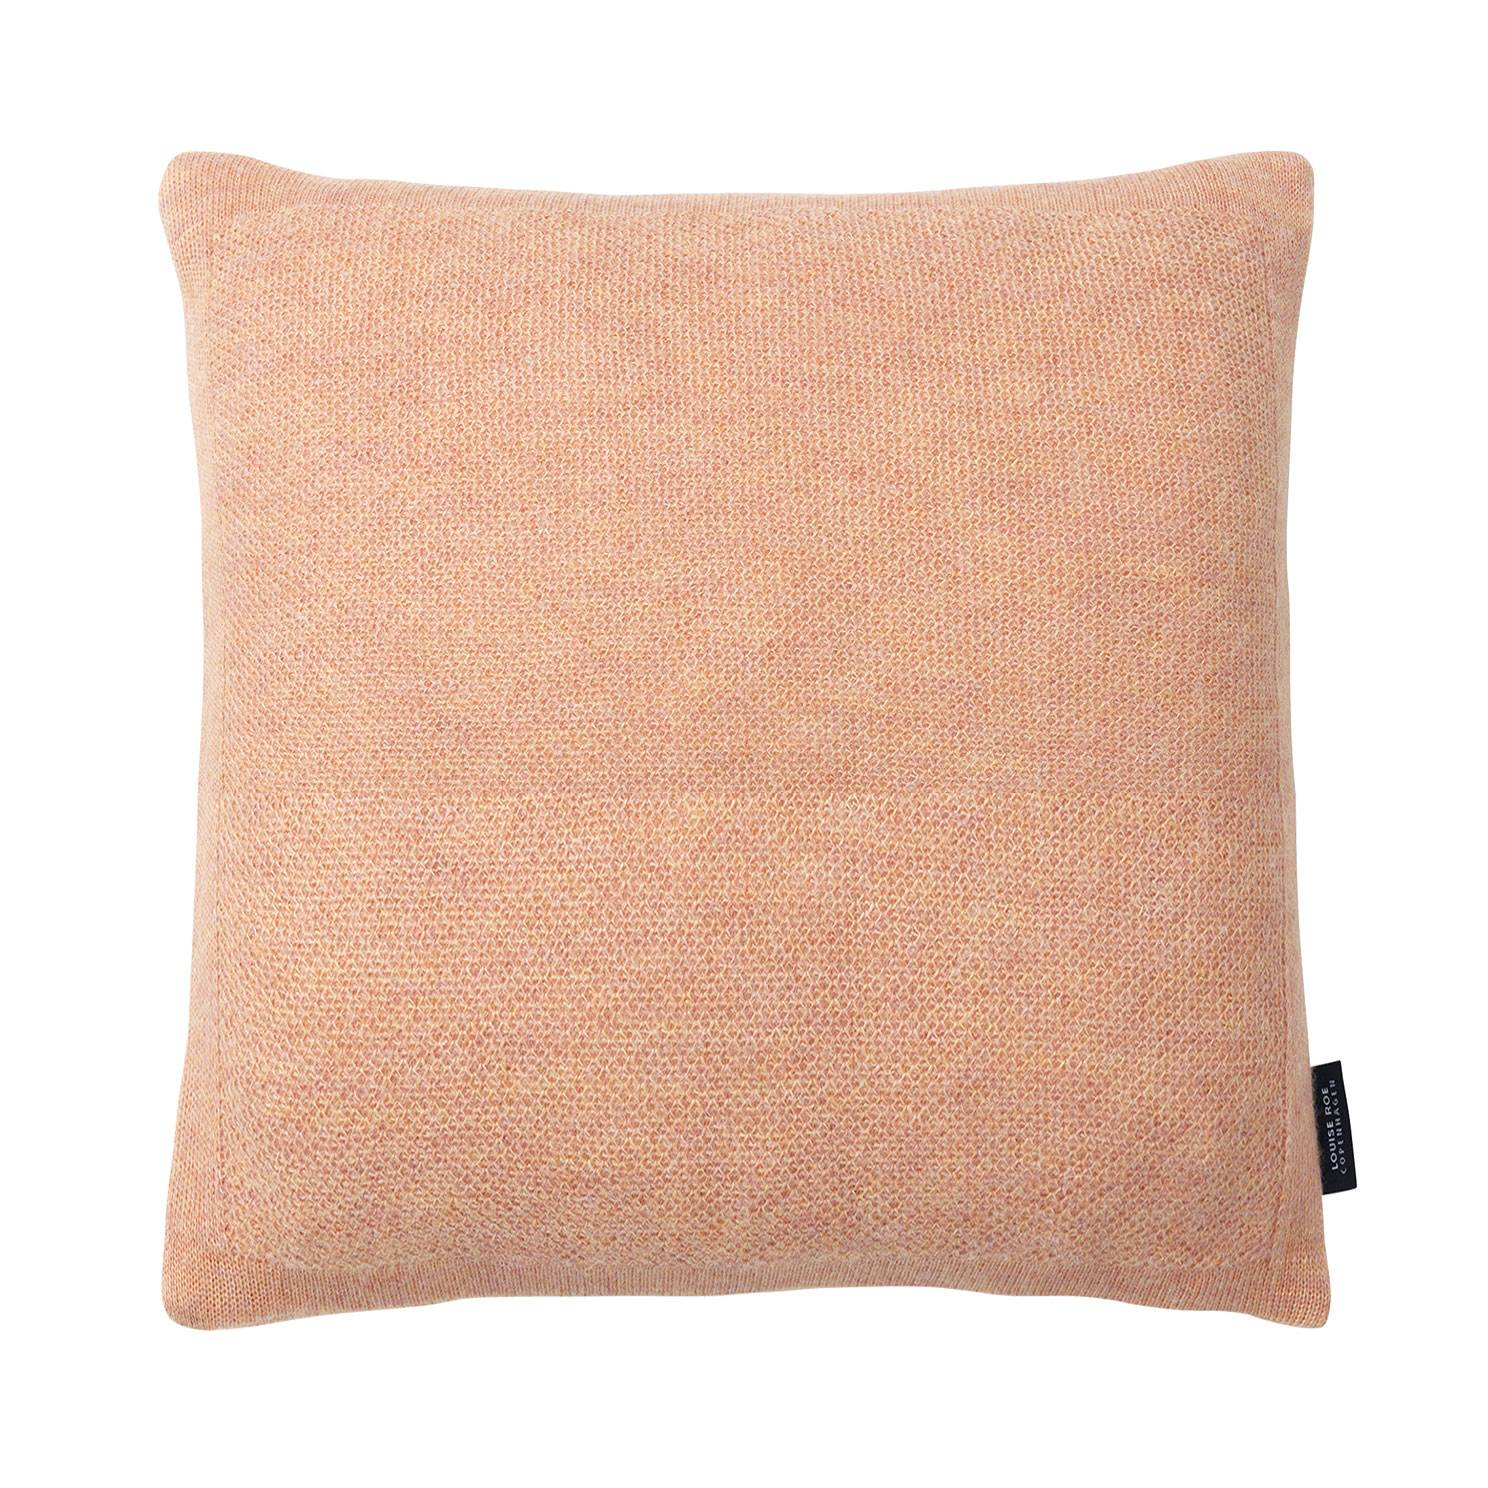 Louise Roe Tyyny Pique 50x50cm, Pearl Peach